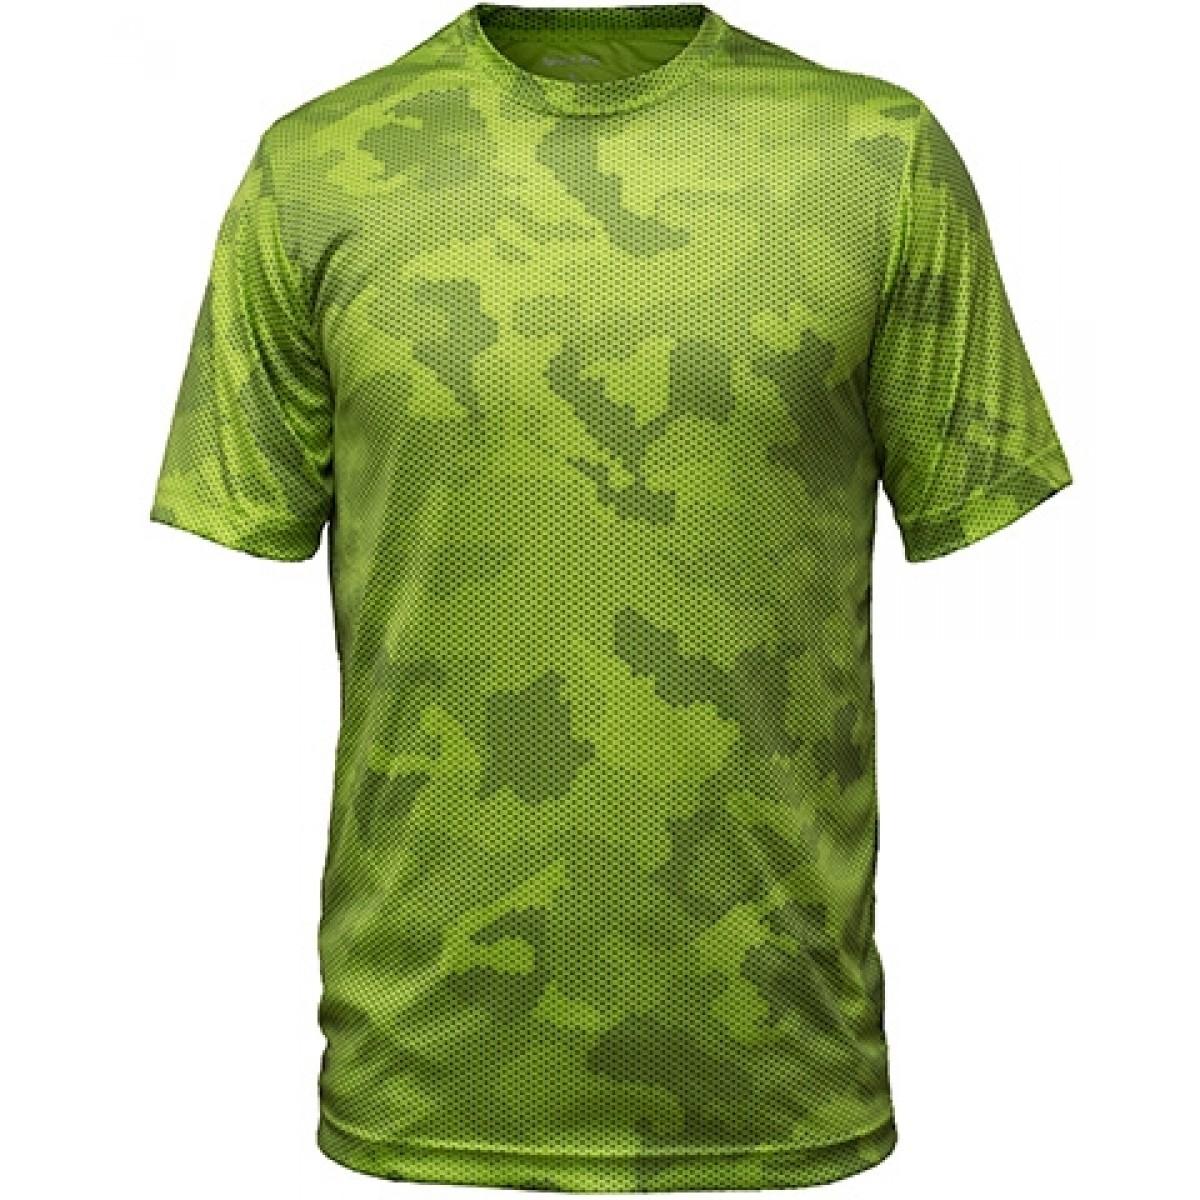 Camo Short Sleeve-Green-YL